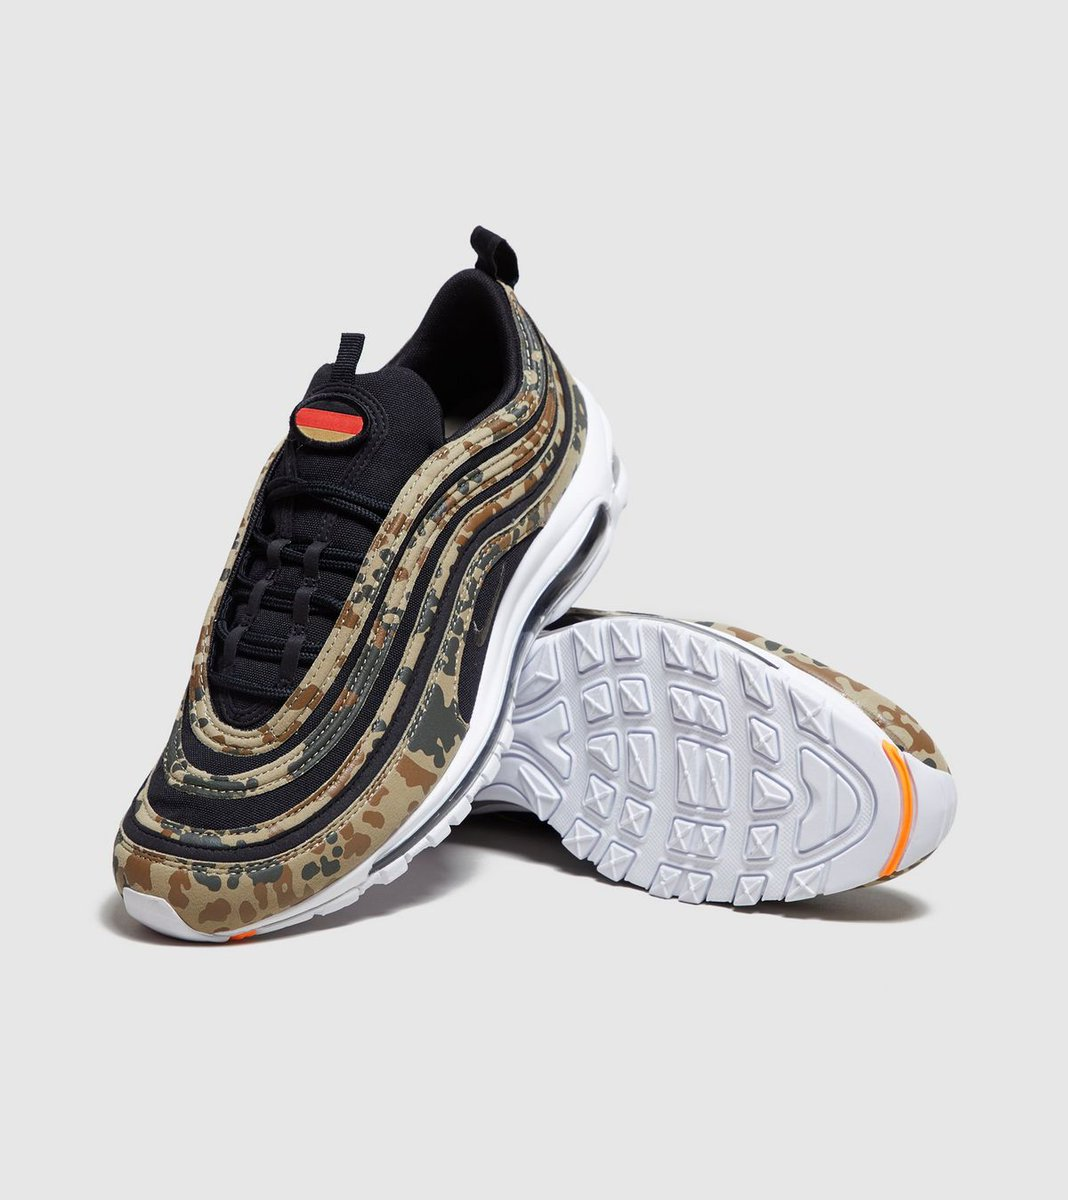 promo code 89a93 45d6b SneakerAlert on Twitter: